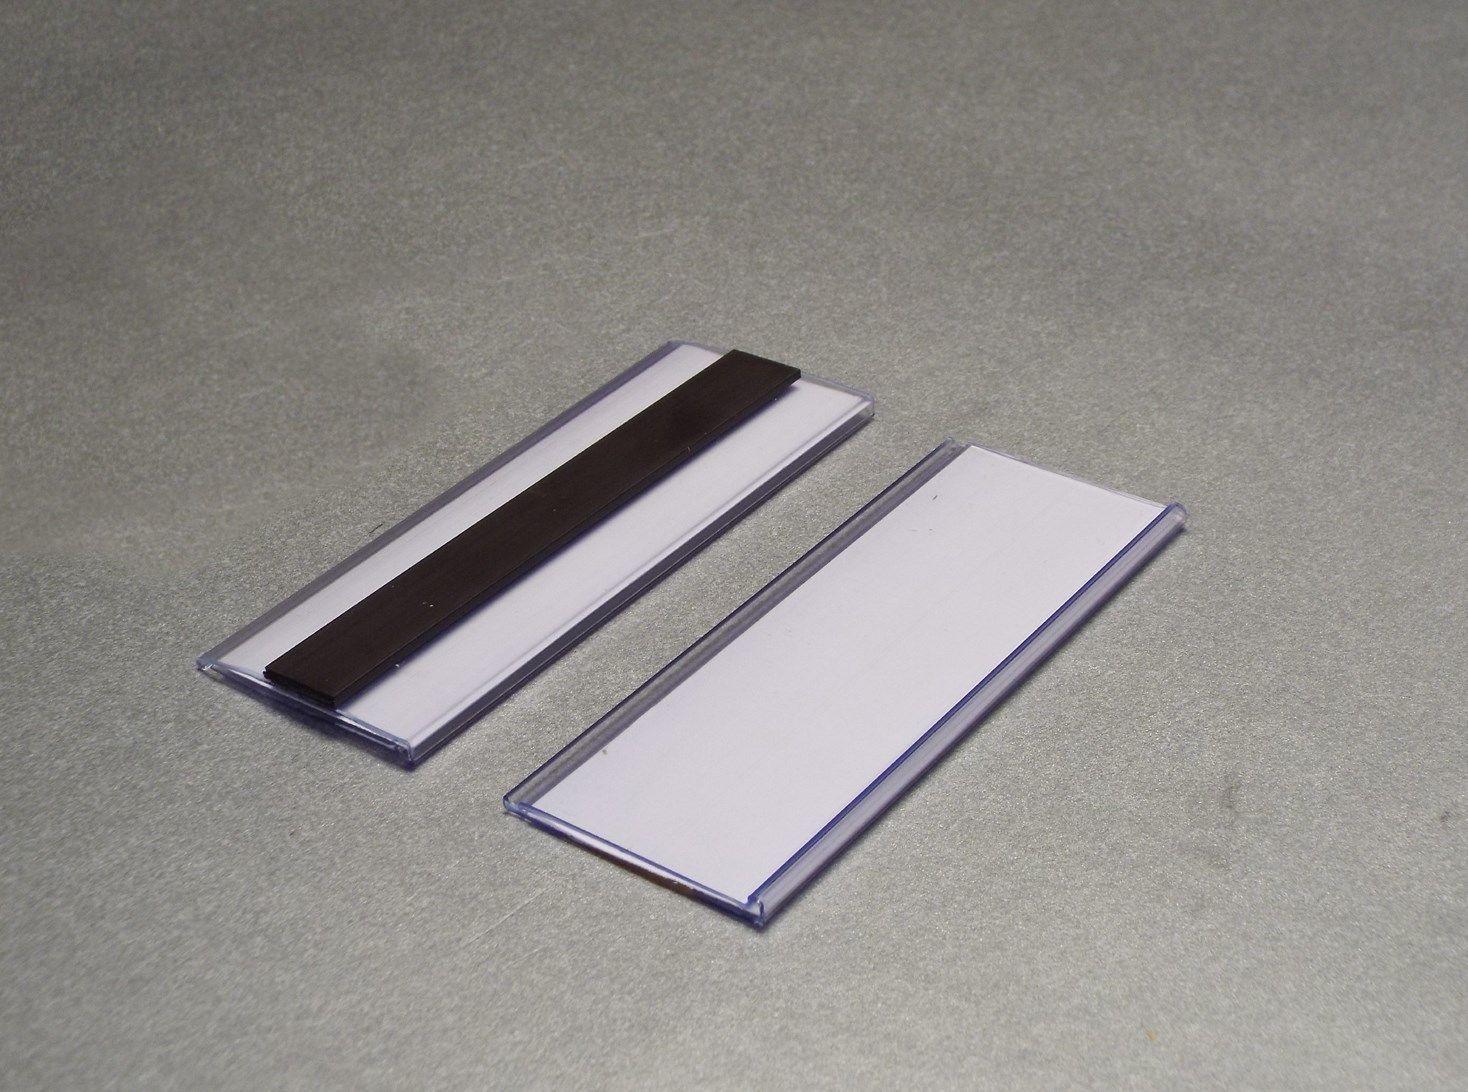 Magnetic Ticket Holders 38mm HIGH EPOS Strips 100mm LONG PK 100